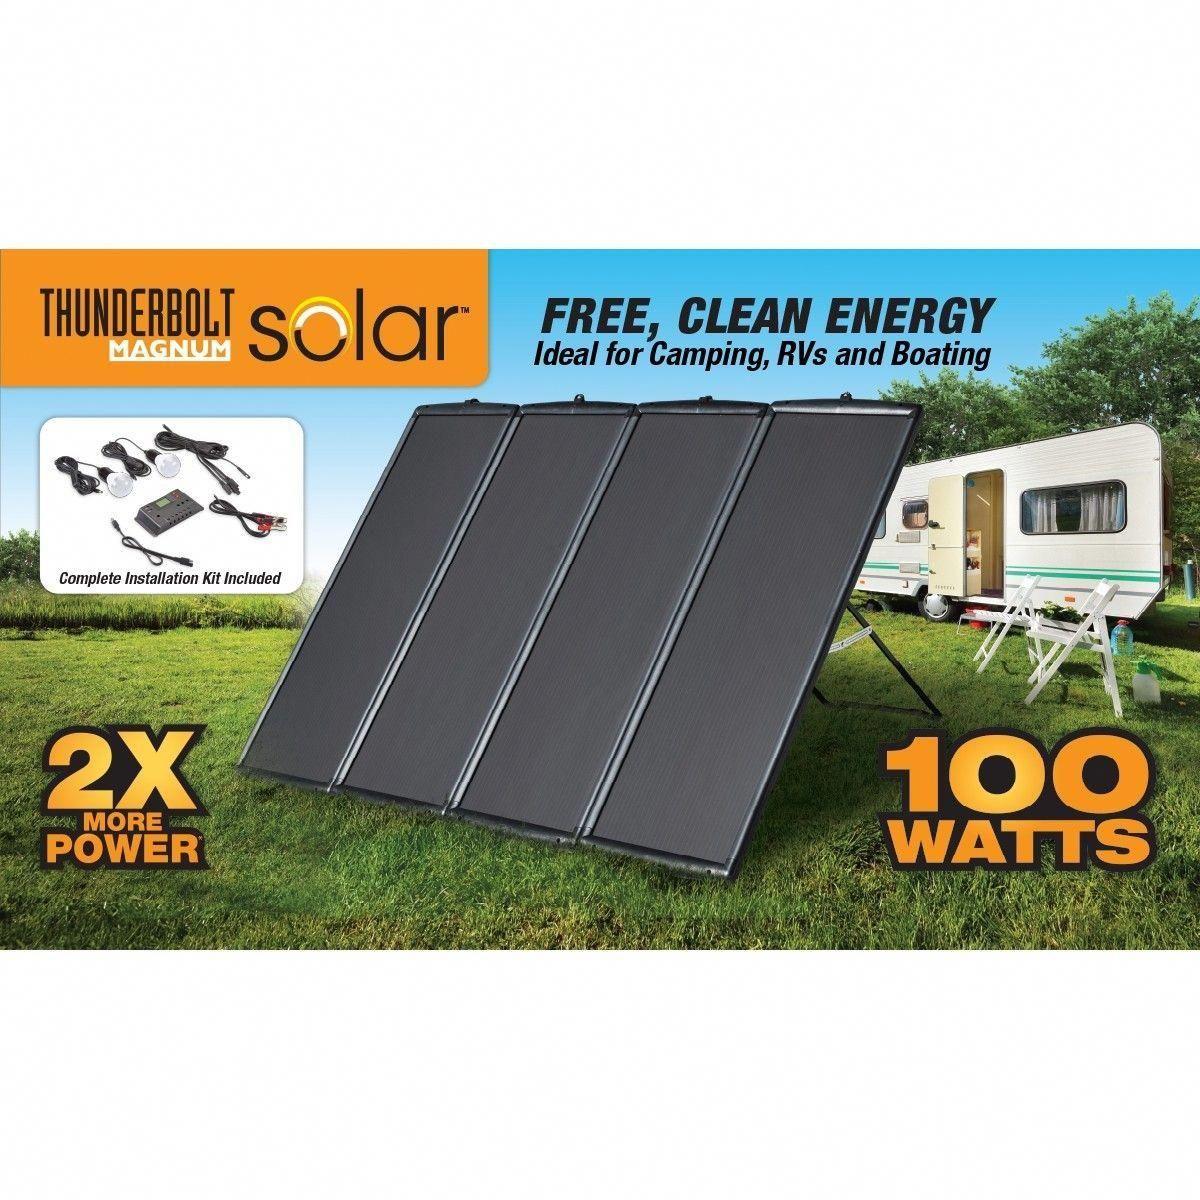 100 Watt Solar Panel Kit In 2020 Solar Heating Solar Projects Solar Technology